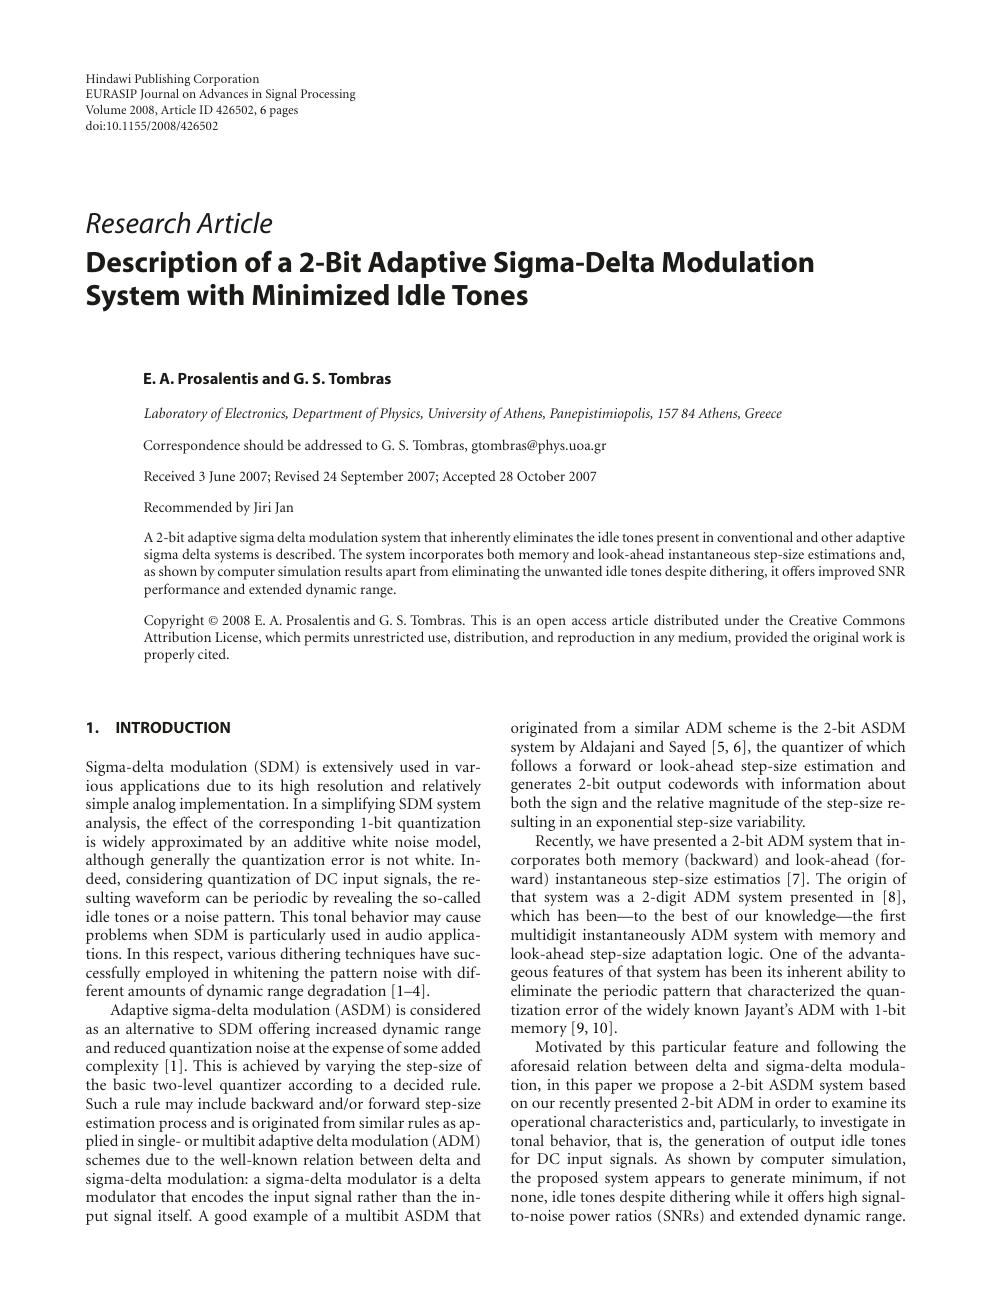 Description of a 2-Bit Adaptive Sigma-Delta Modulation System with